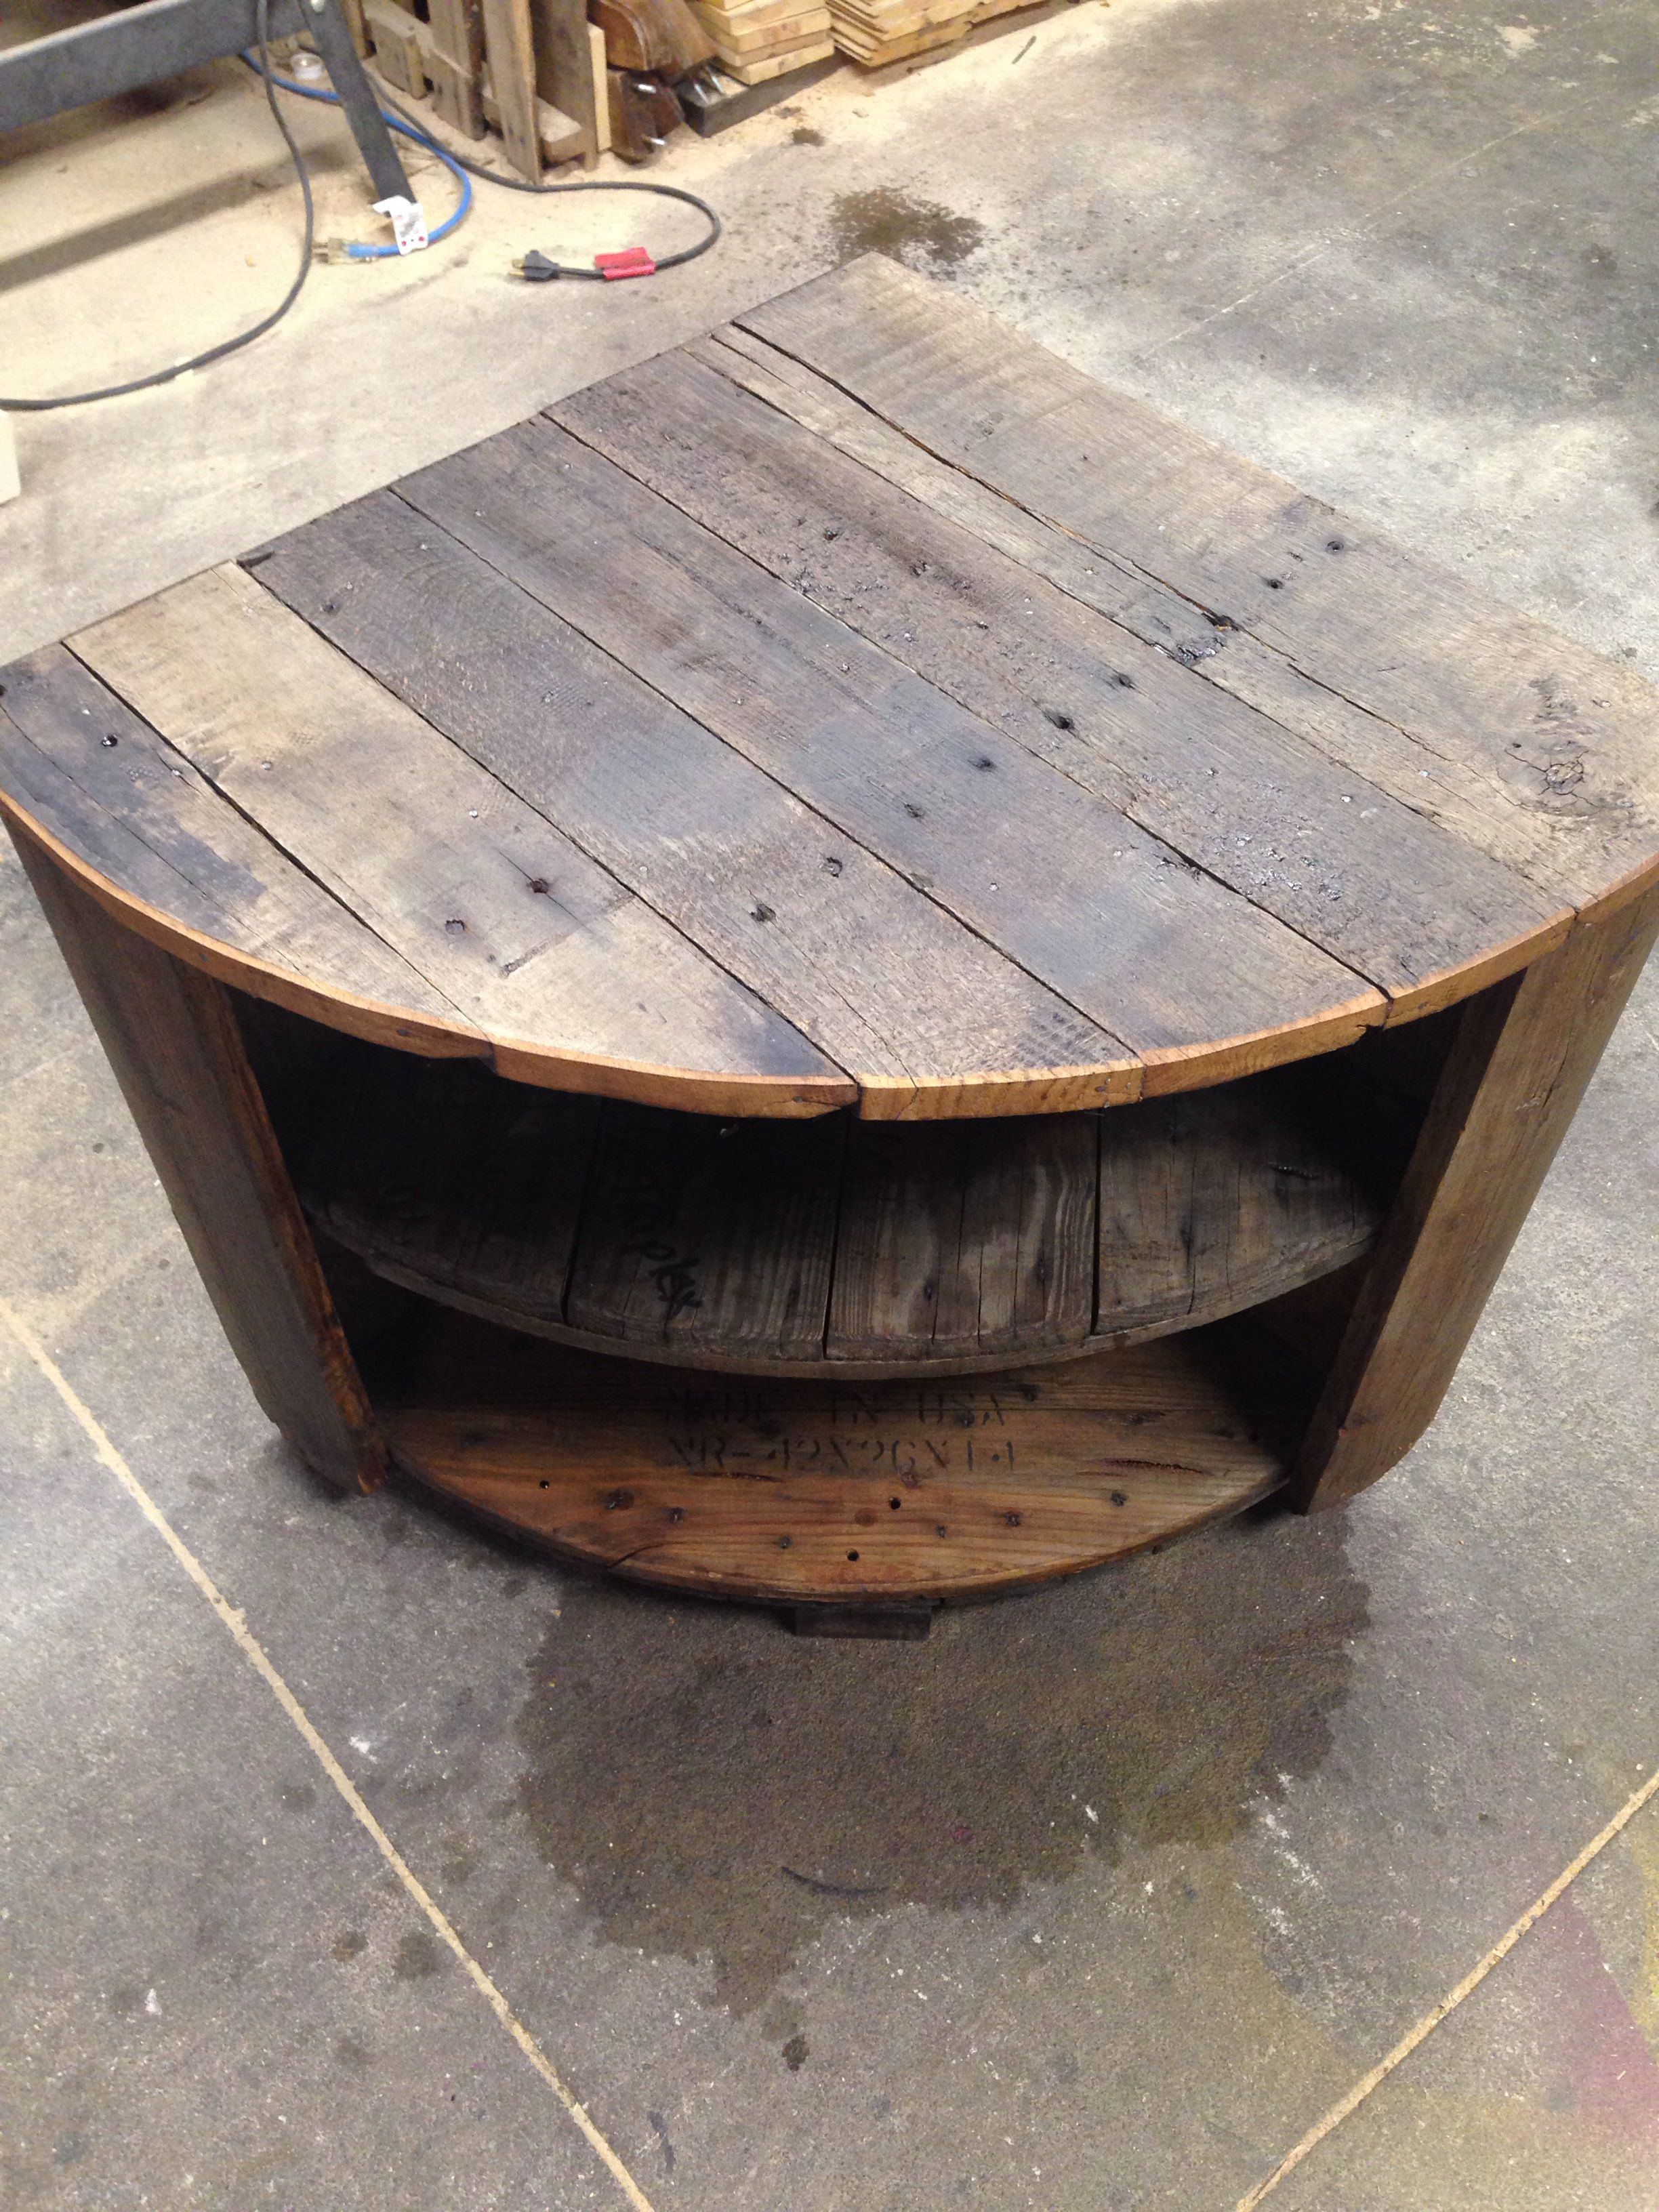 pingl par daniel kelley sur anything pallets pinterest bobine touret et bois. Black Bedroom Furniture Sets. Home Design Ideas